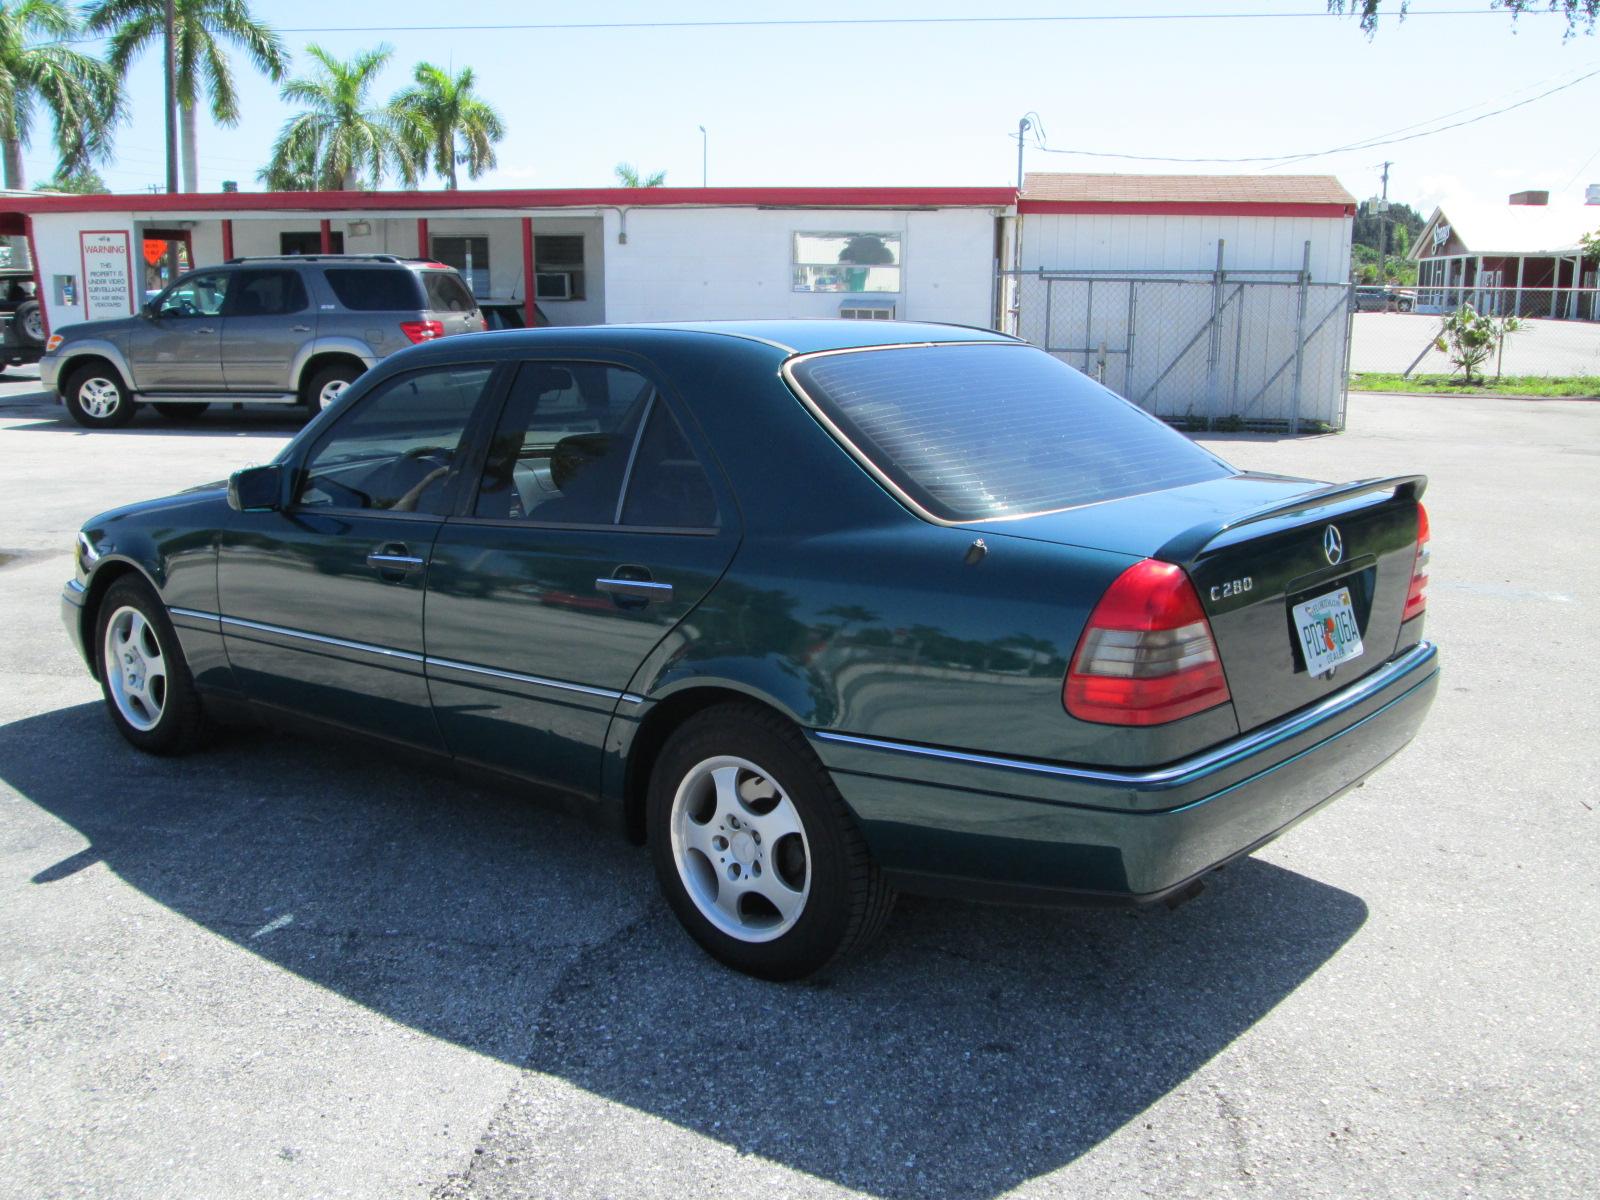 1997 Mercedes-Benz C-Class Reviews - Carsurvey.org